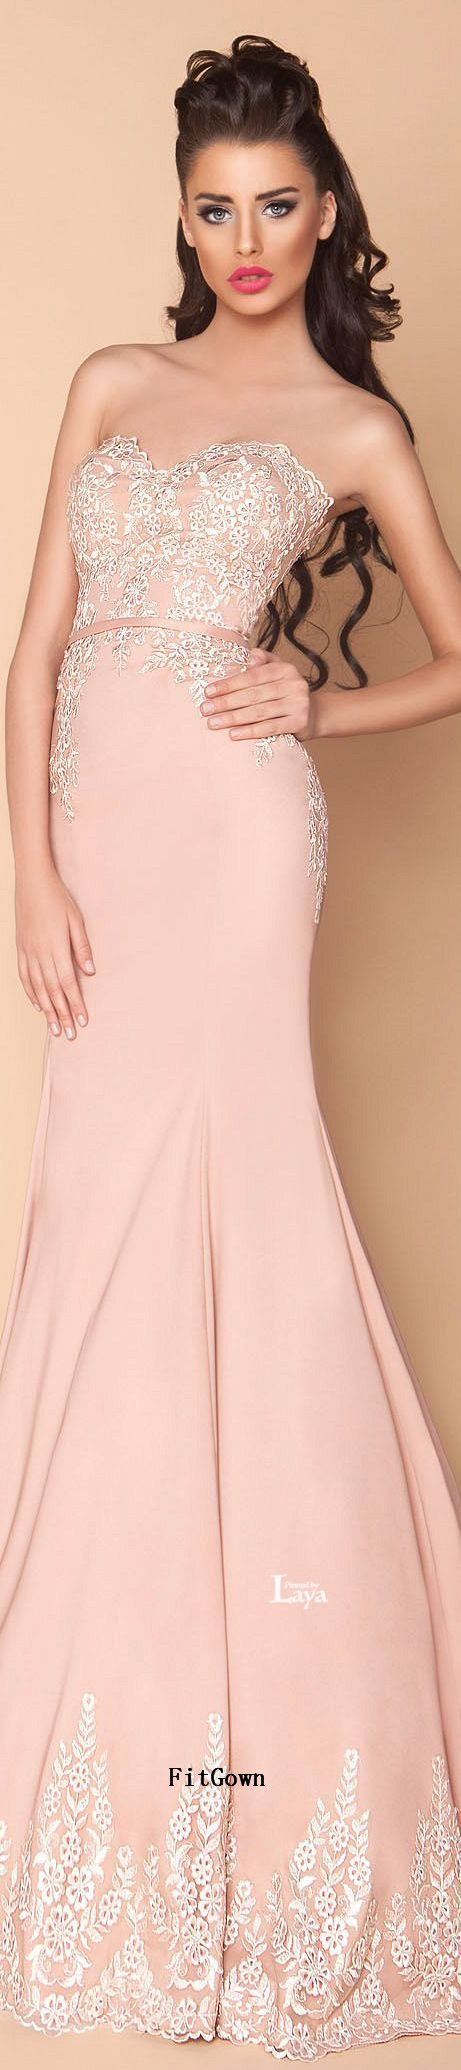 64 best Prom Dresses images on Pinterest | Party wear dresses ...